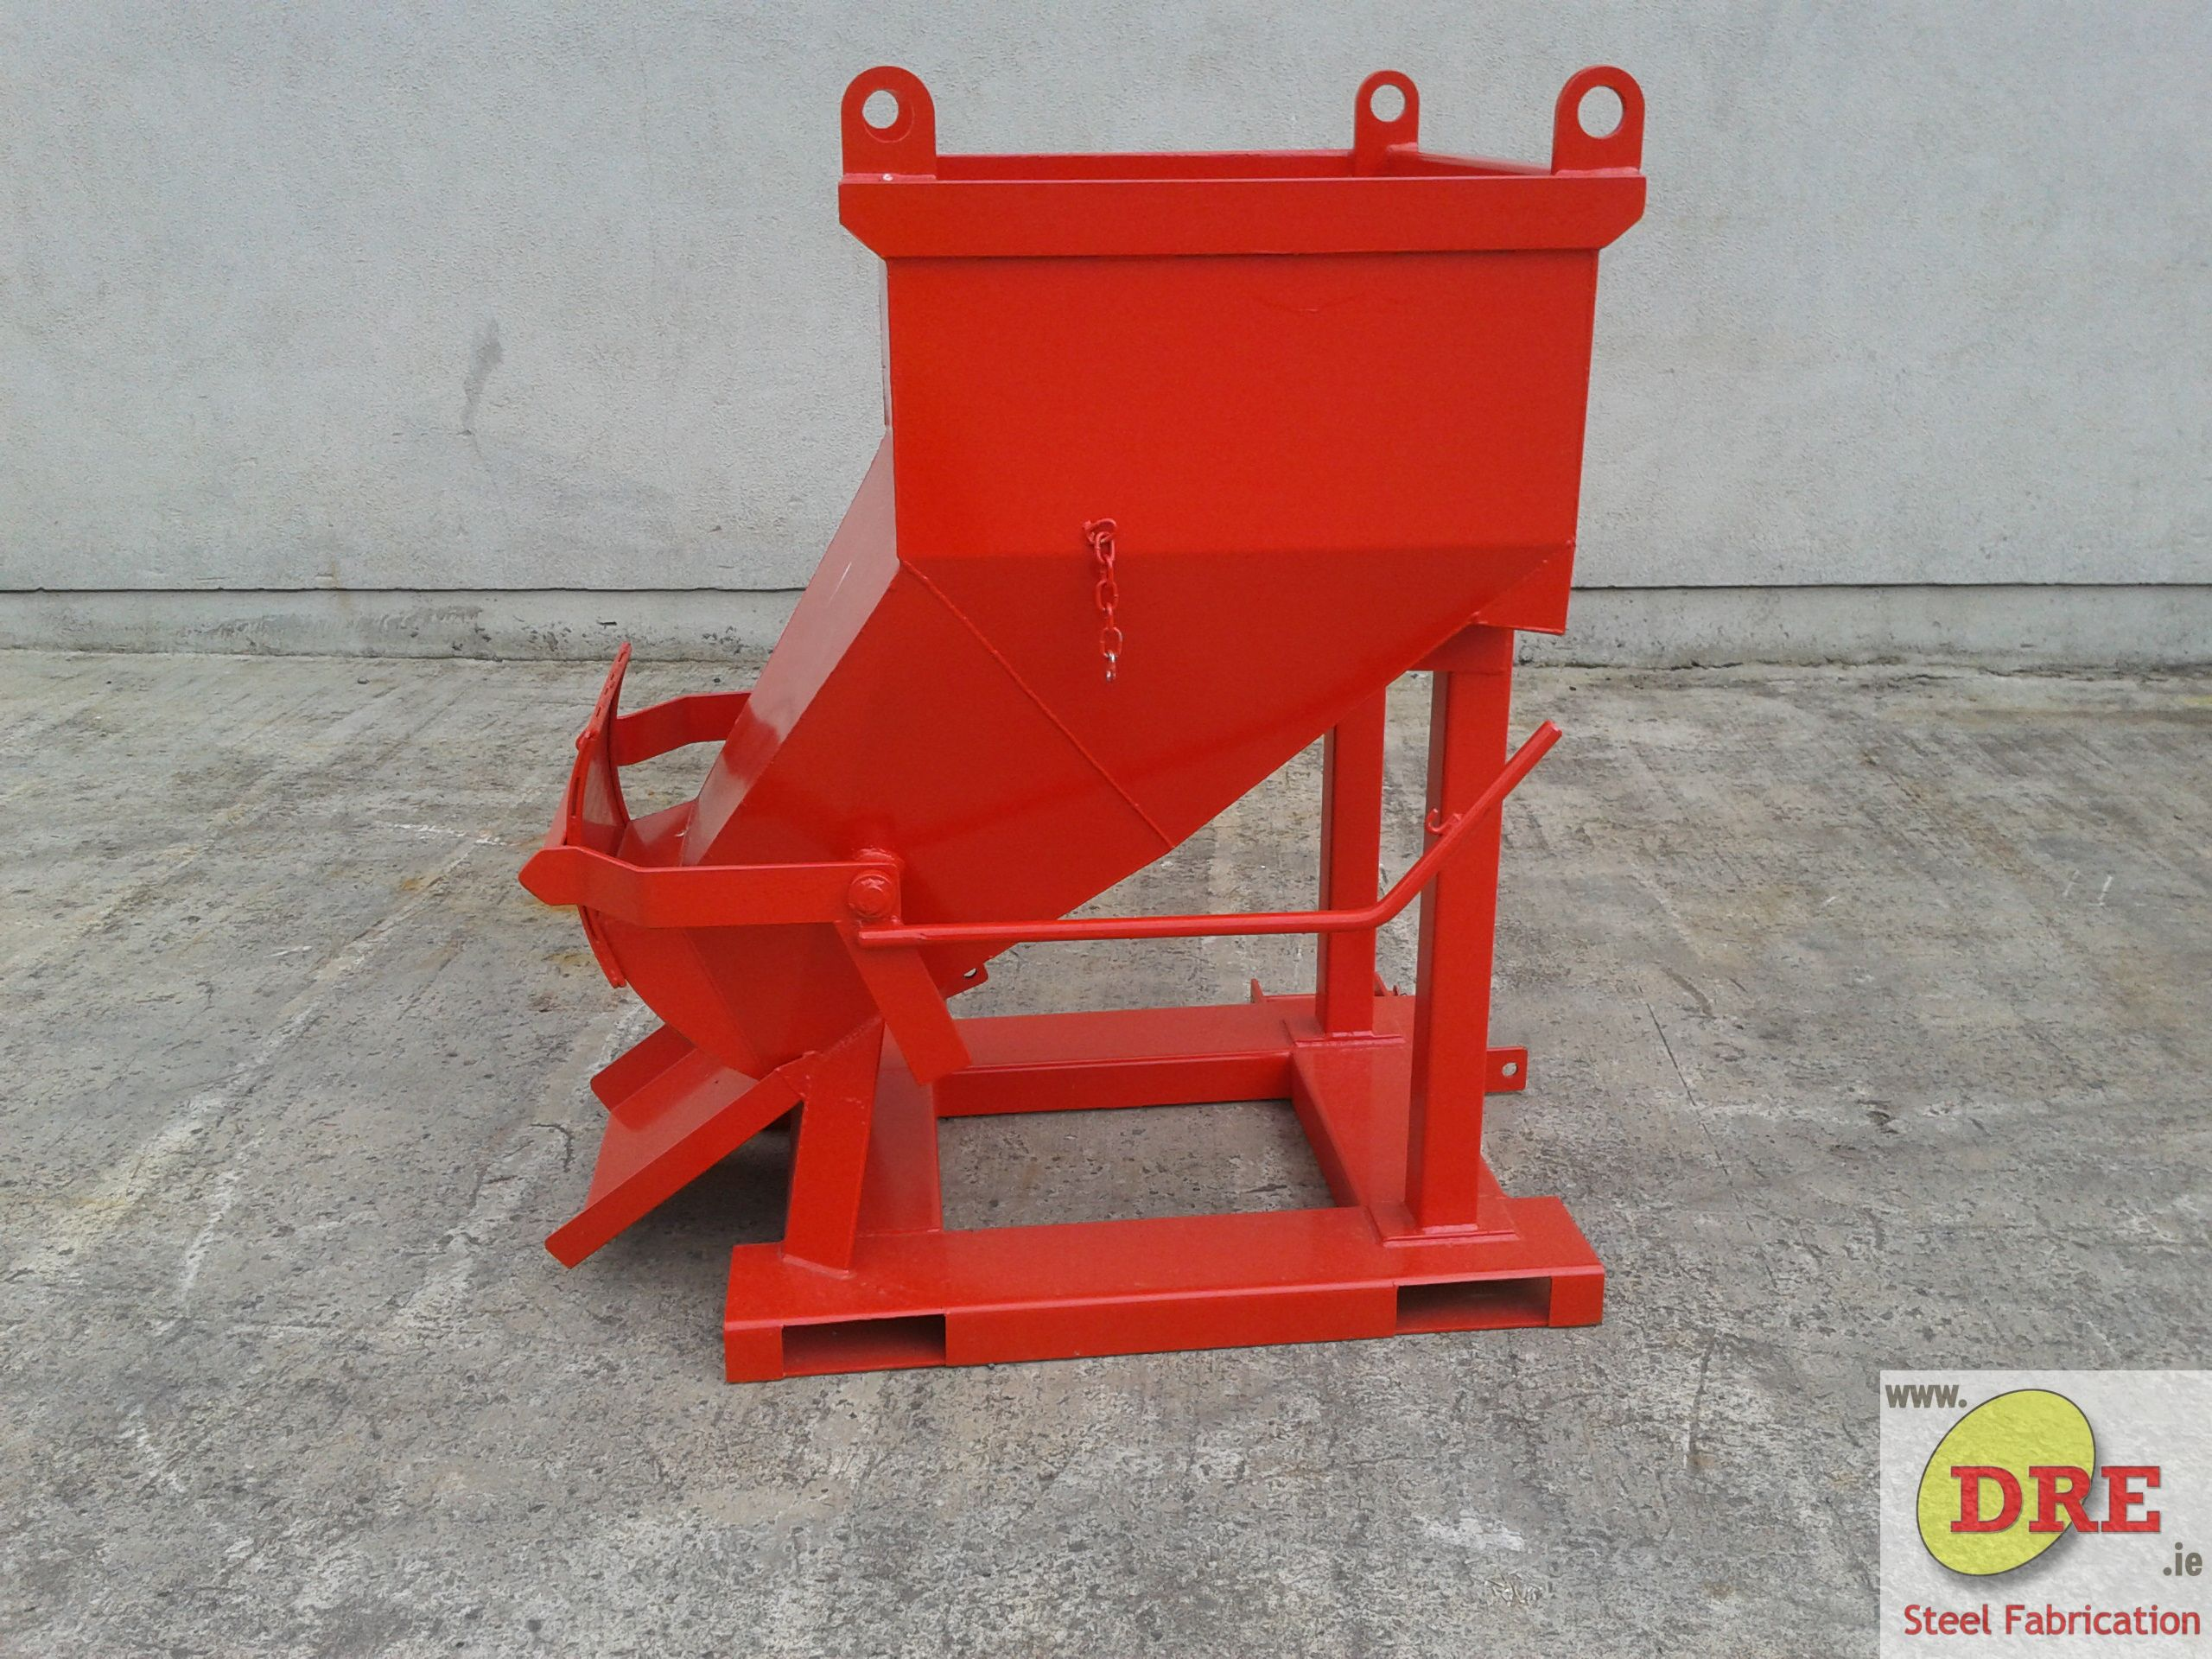 hydraulic/teleporter cone dre.ie